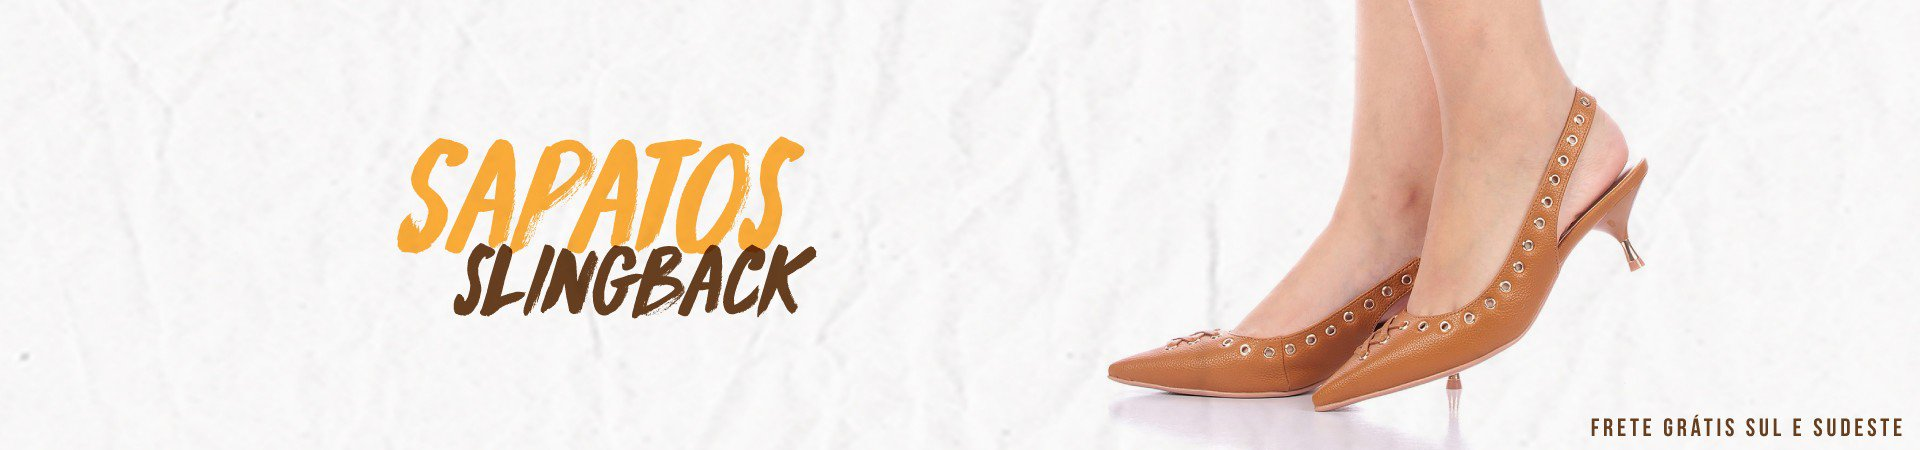 sapatos slingback